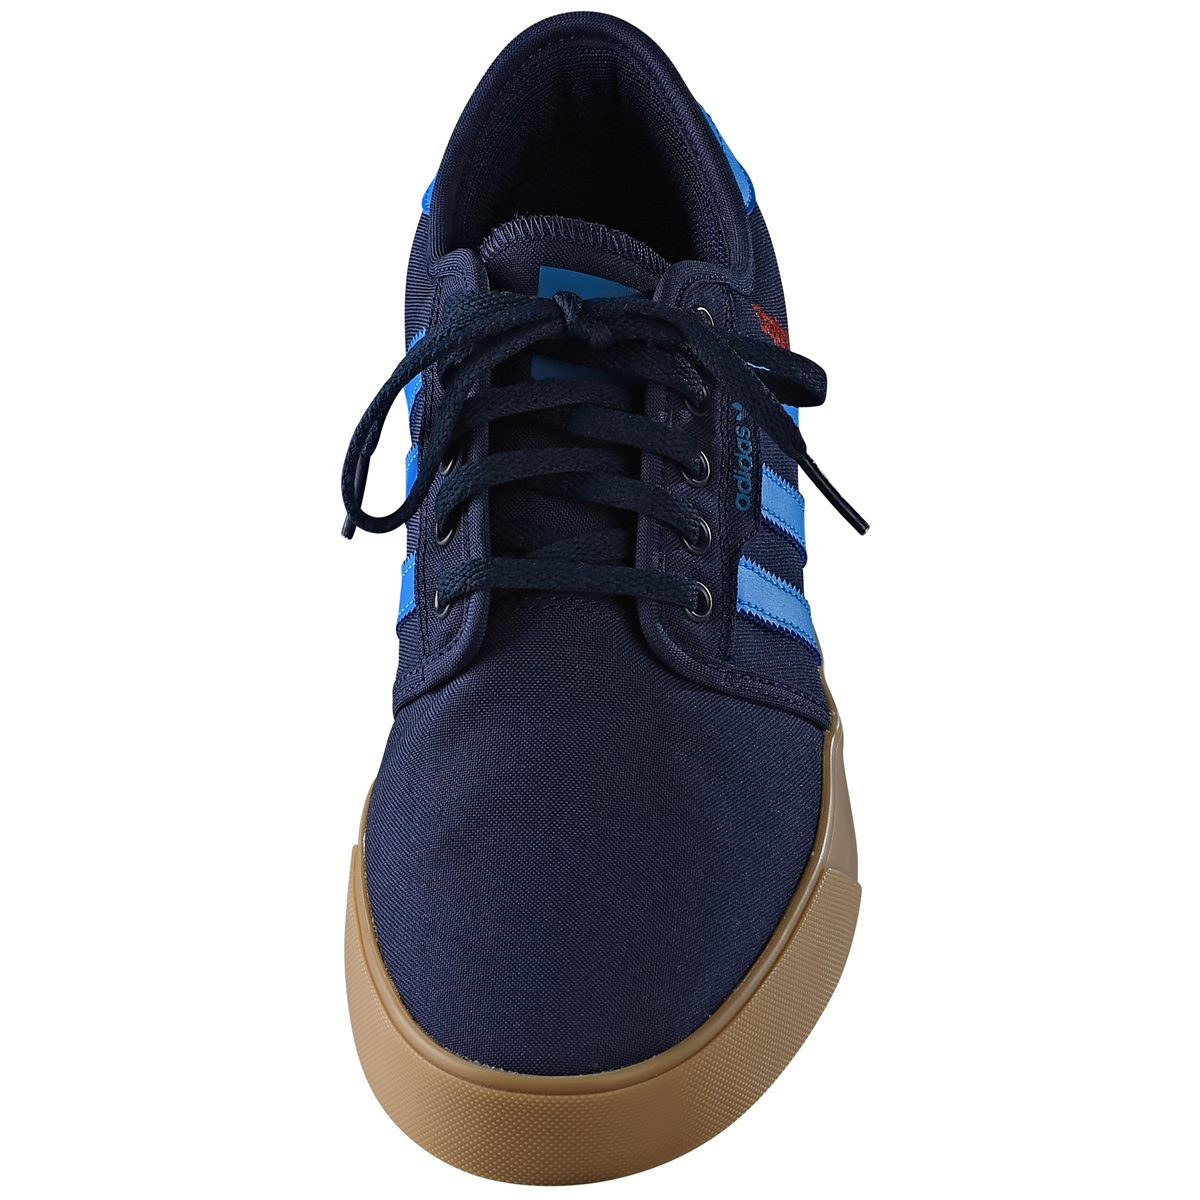 Troy Lee Designs 2019 Team Adidas Shoe | Schuhe | Wiggle